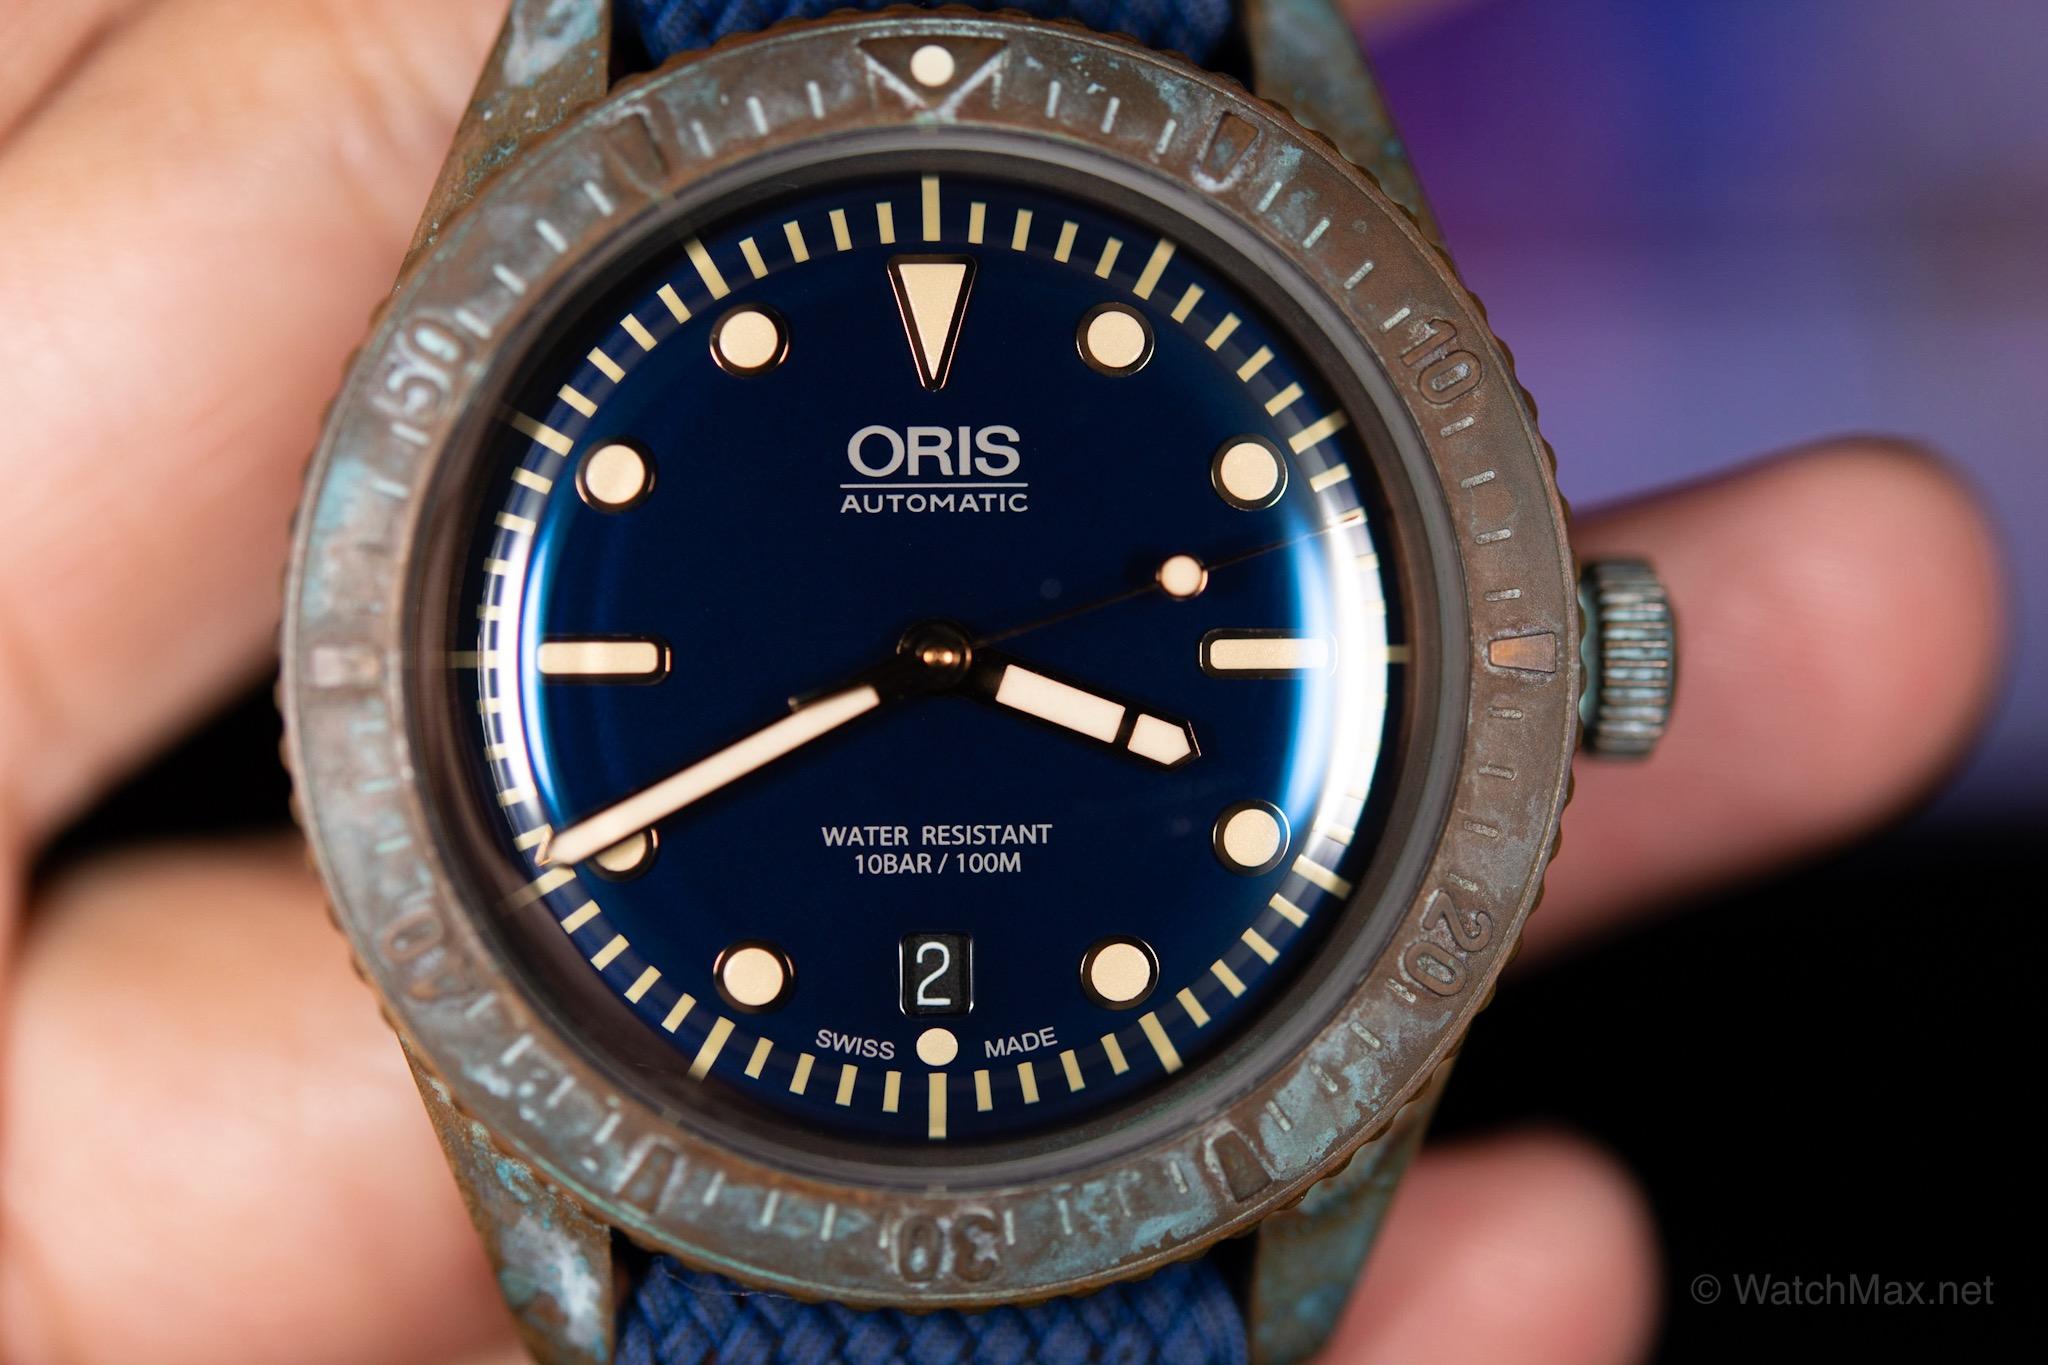 oris-diver-sixtyfive-carl-brashear-limited-edition-9.JPG